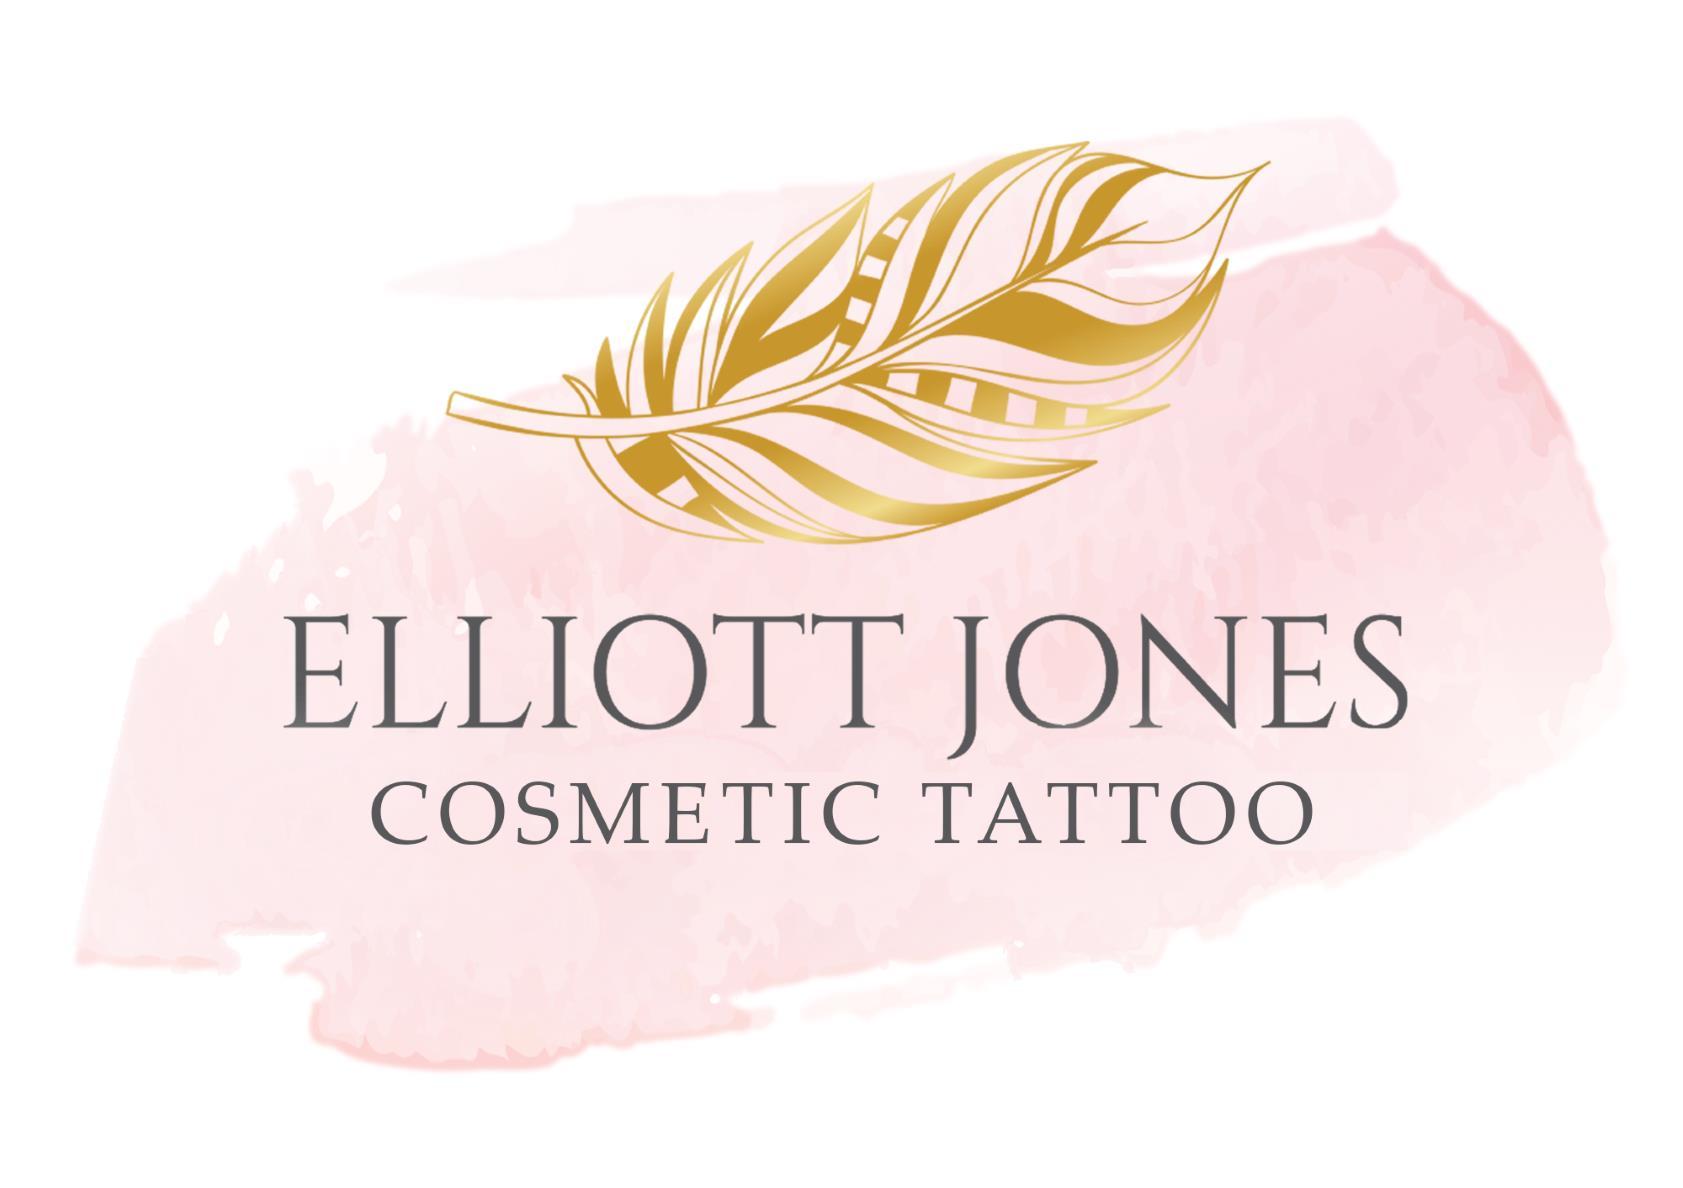 Elliott-Jones Cosmetic Tattoo